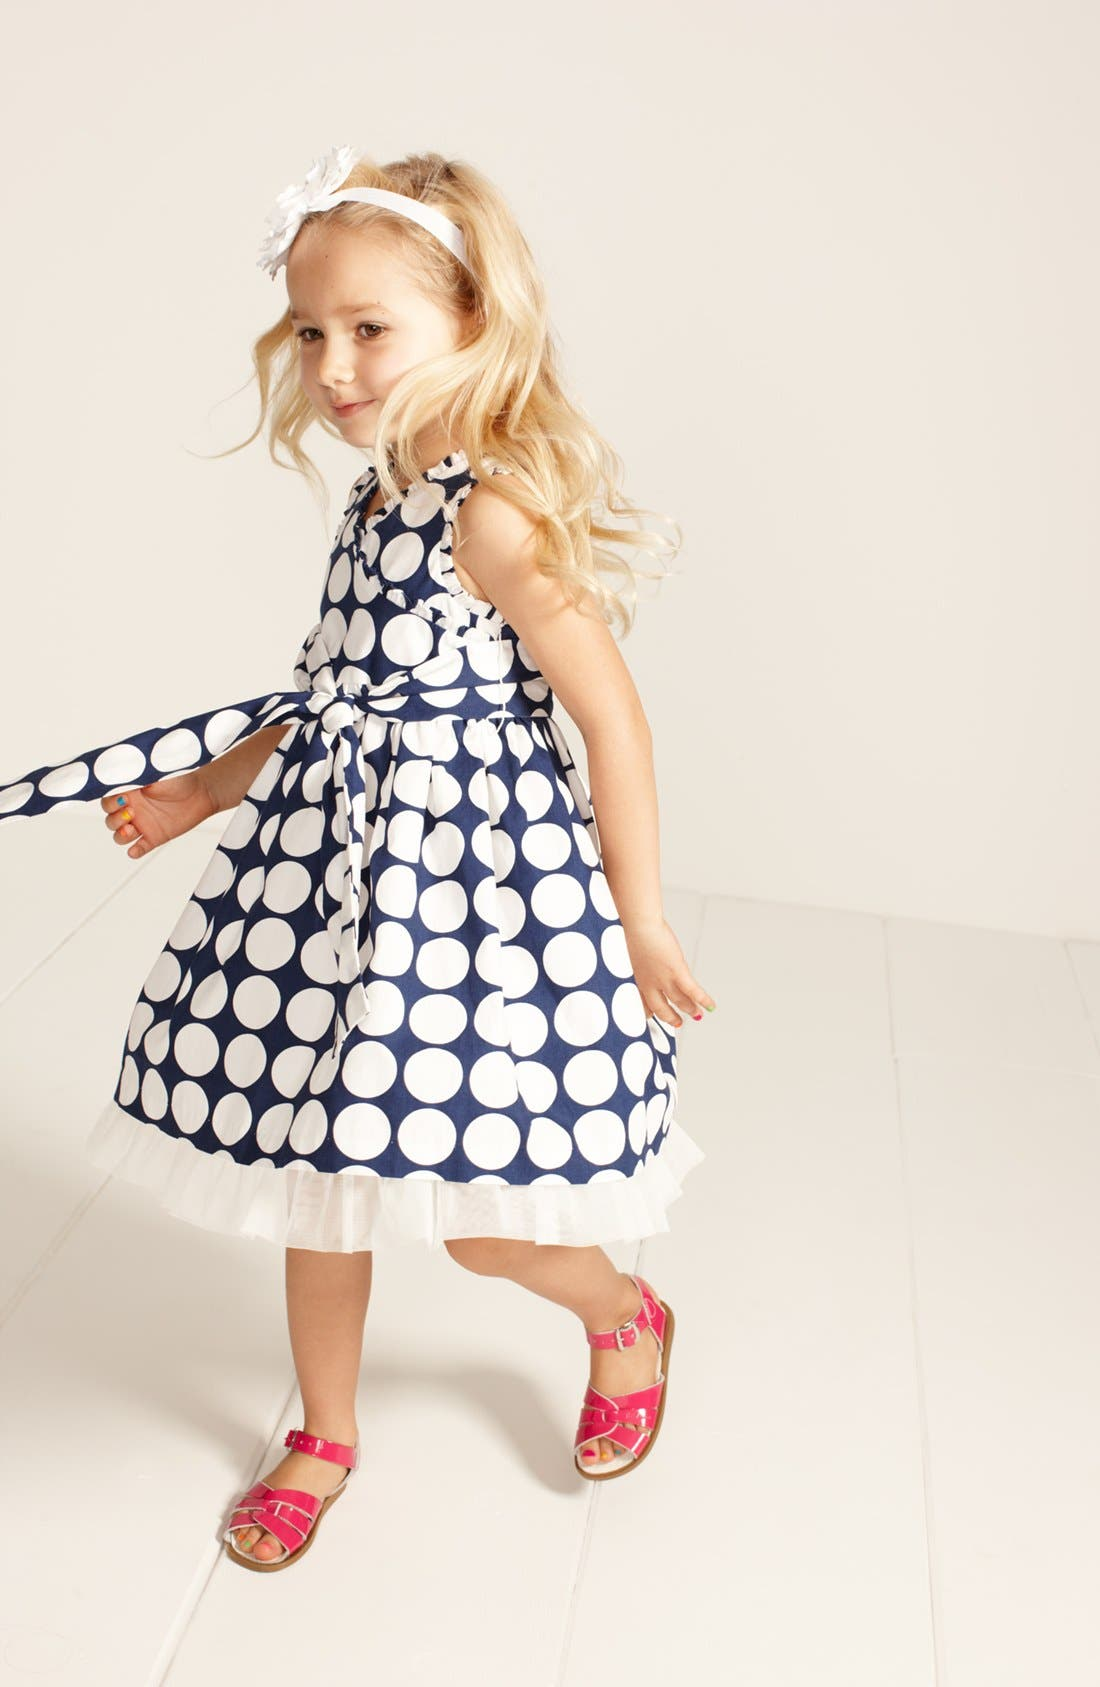 Alternate Image 1 Selected - Marmelatta Dress & Hoy Shoe Salt-Water® Sandal (Toddler Girls, Little Girls & Big Girls)